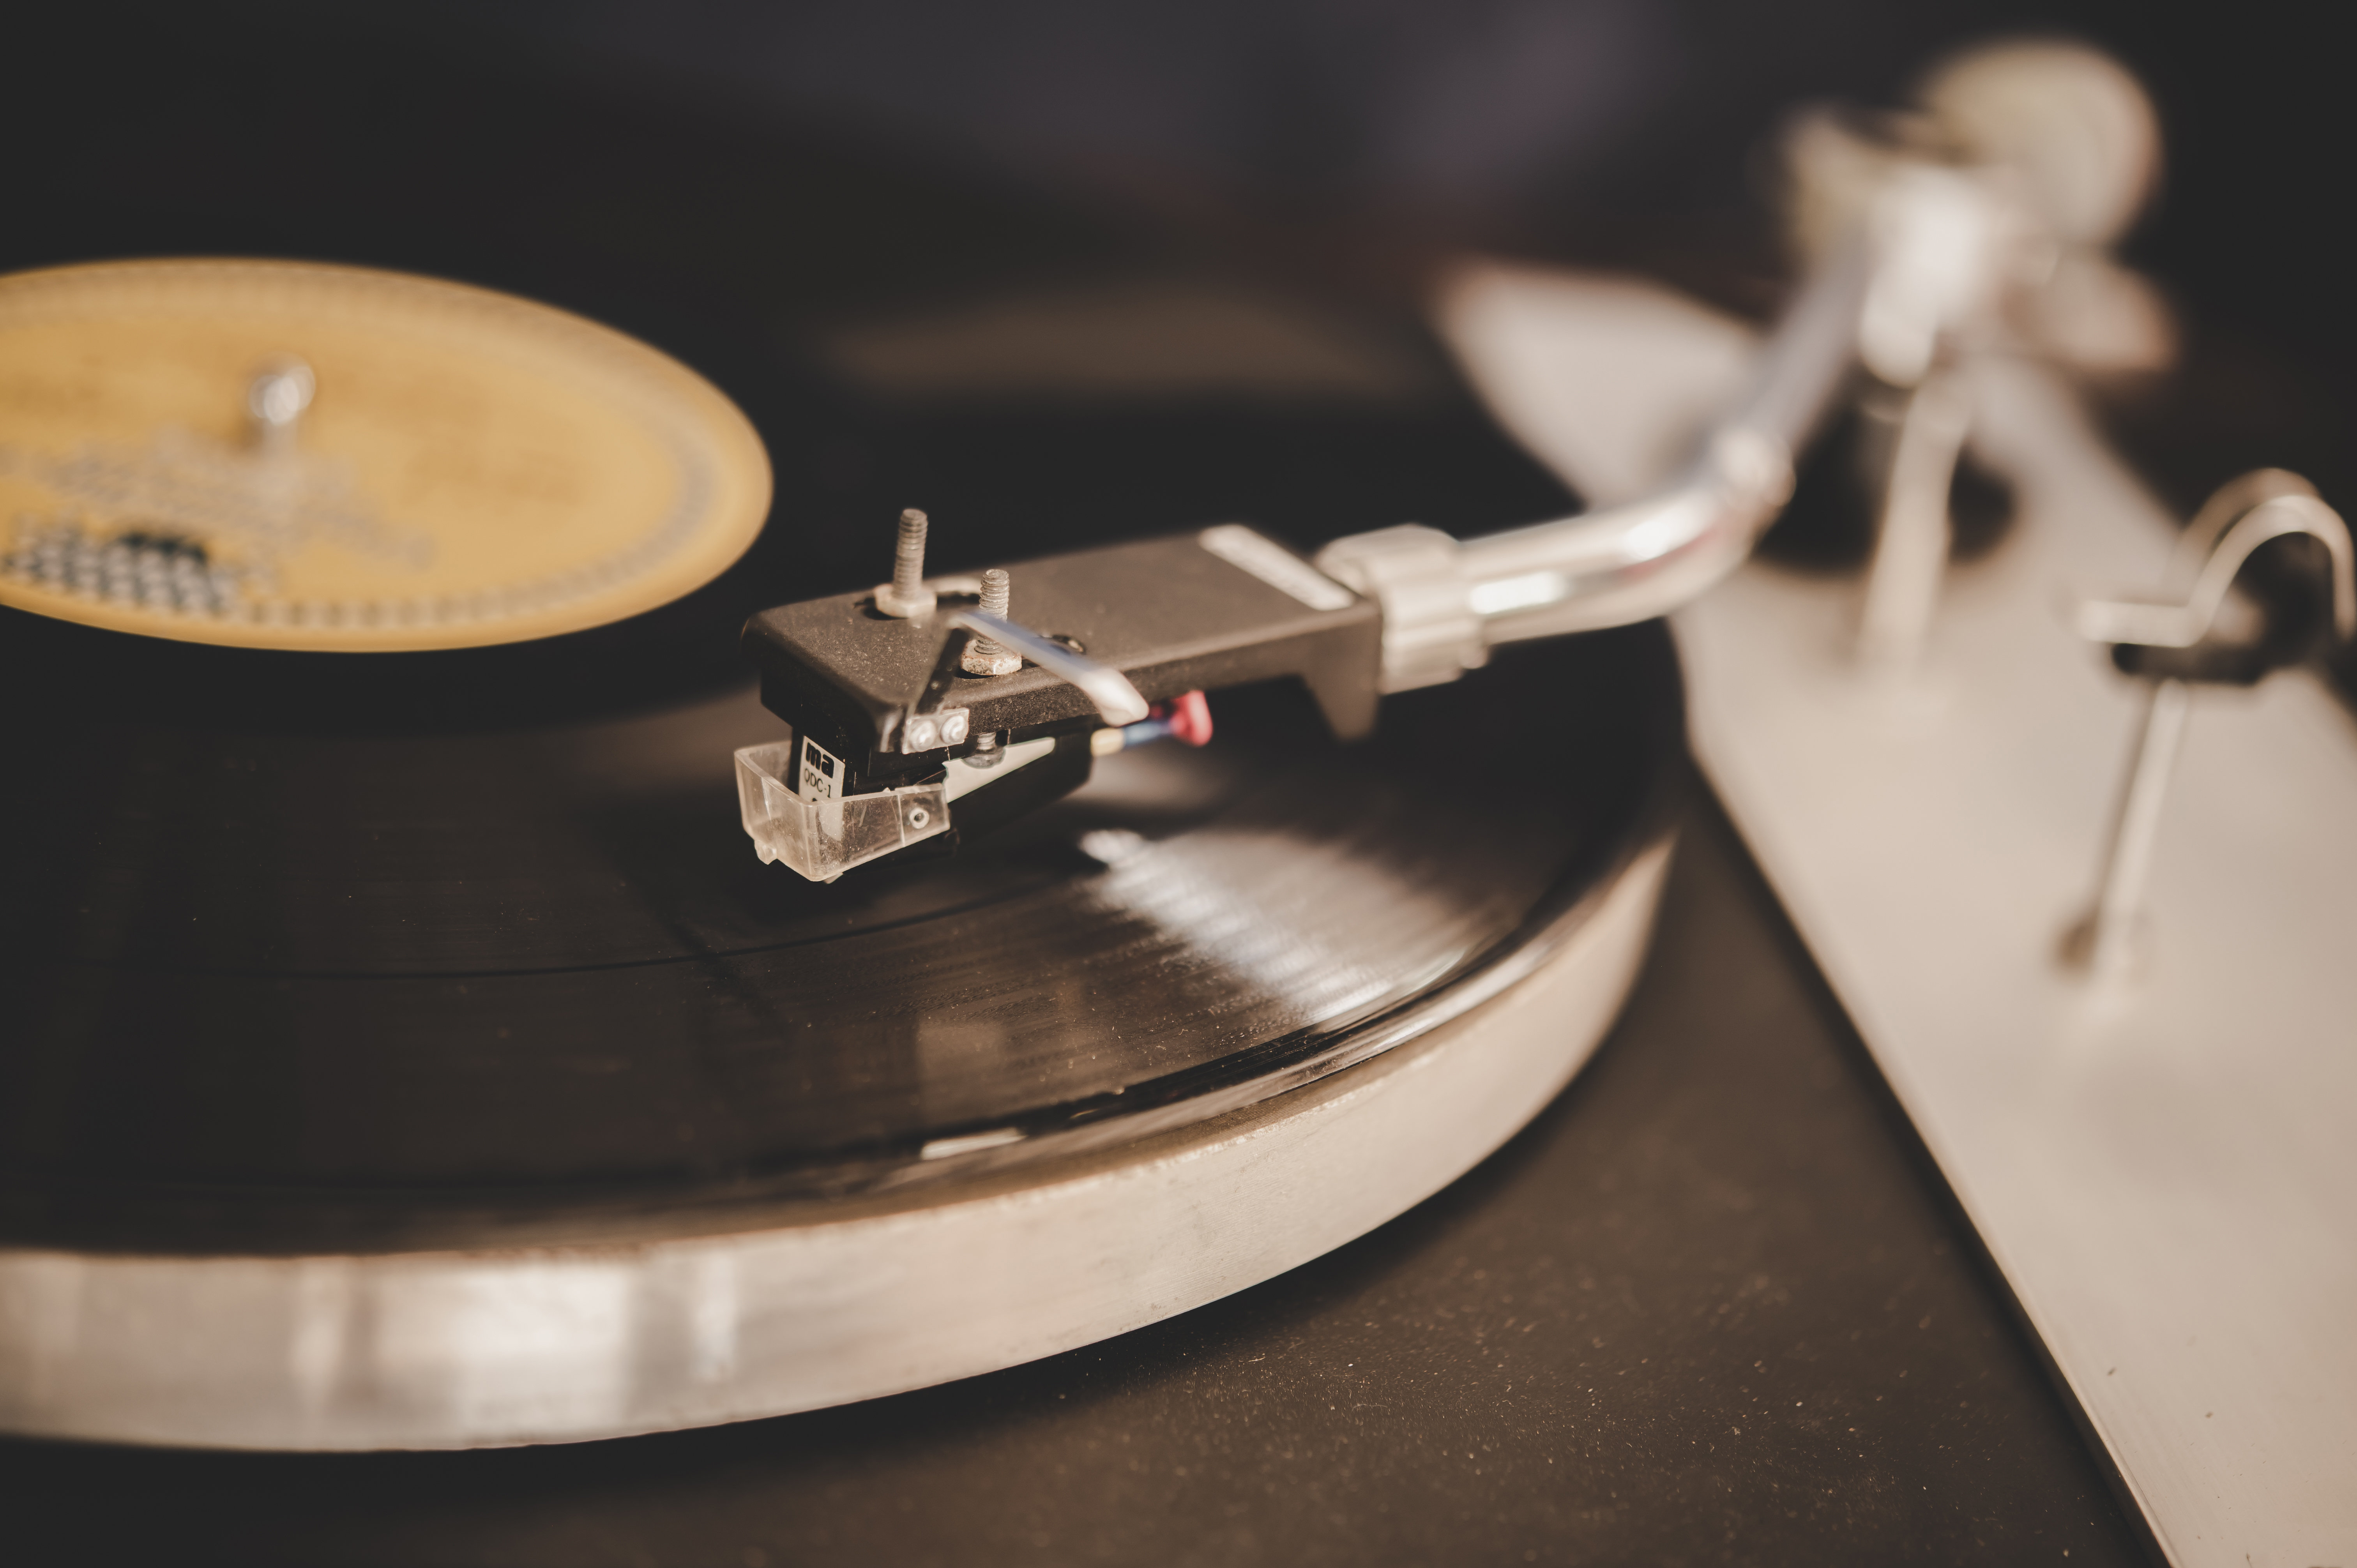 Workshop Muziek verbindt - Offerte